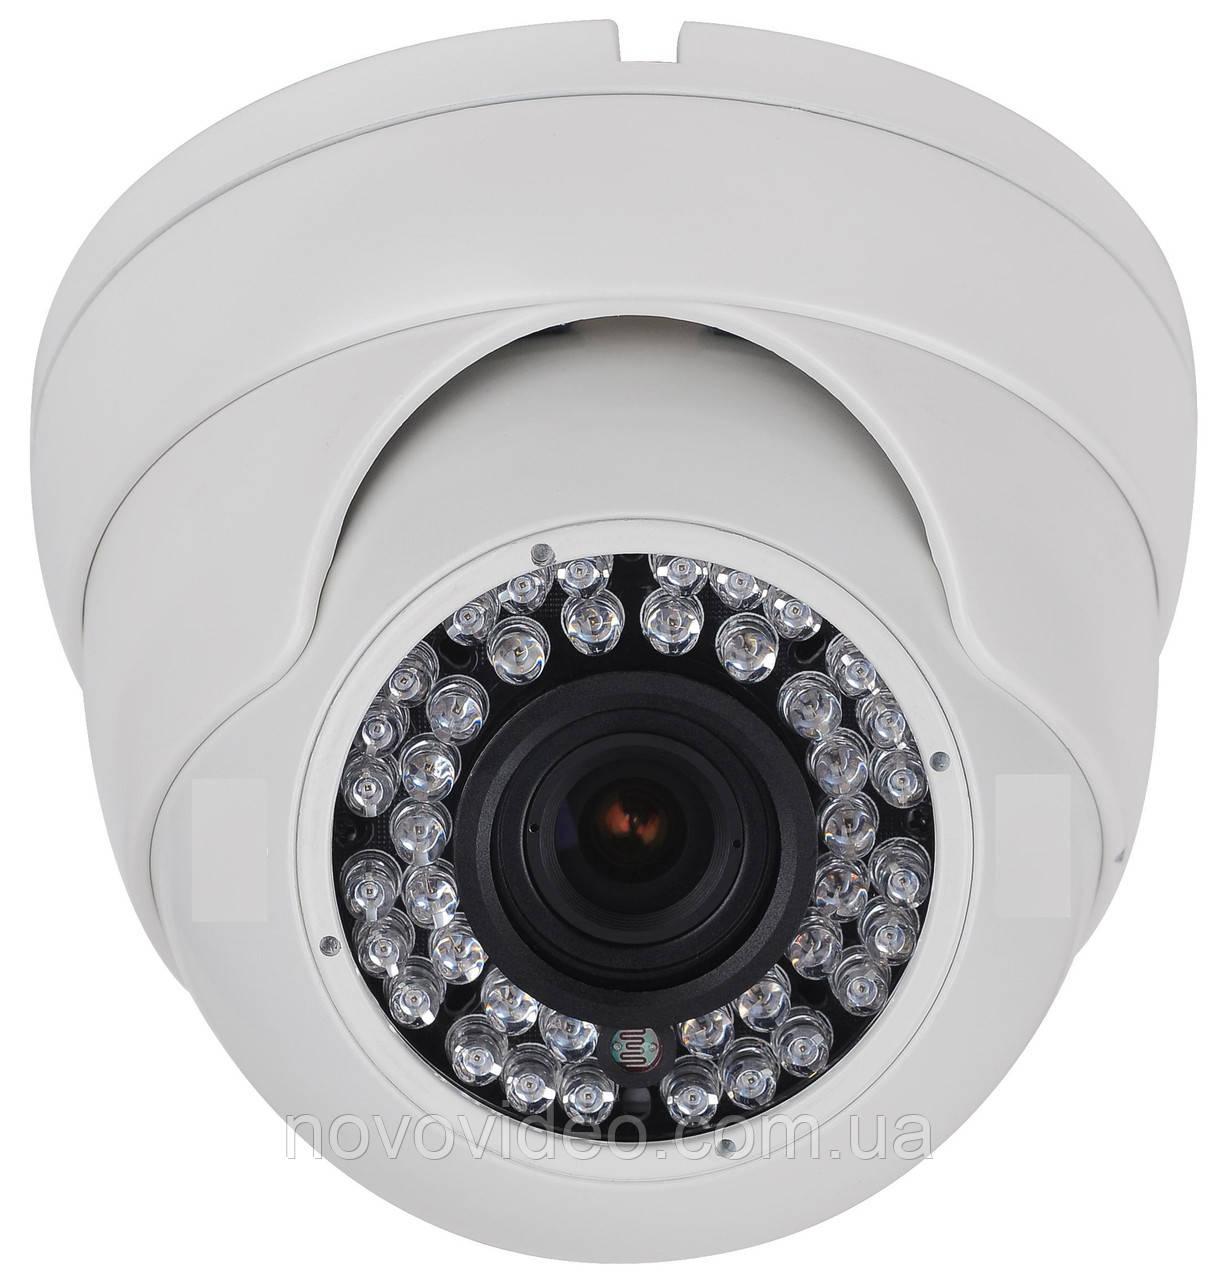 Ip камера CAMSTAR CAM-402D3 IP уличная